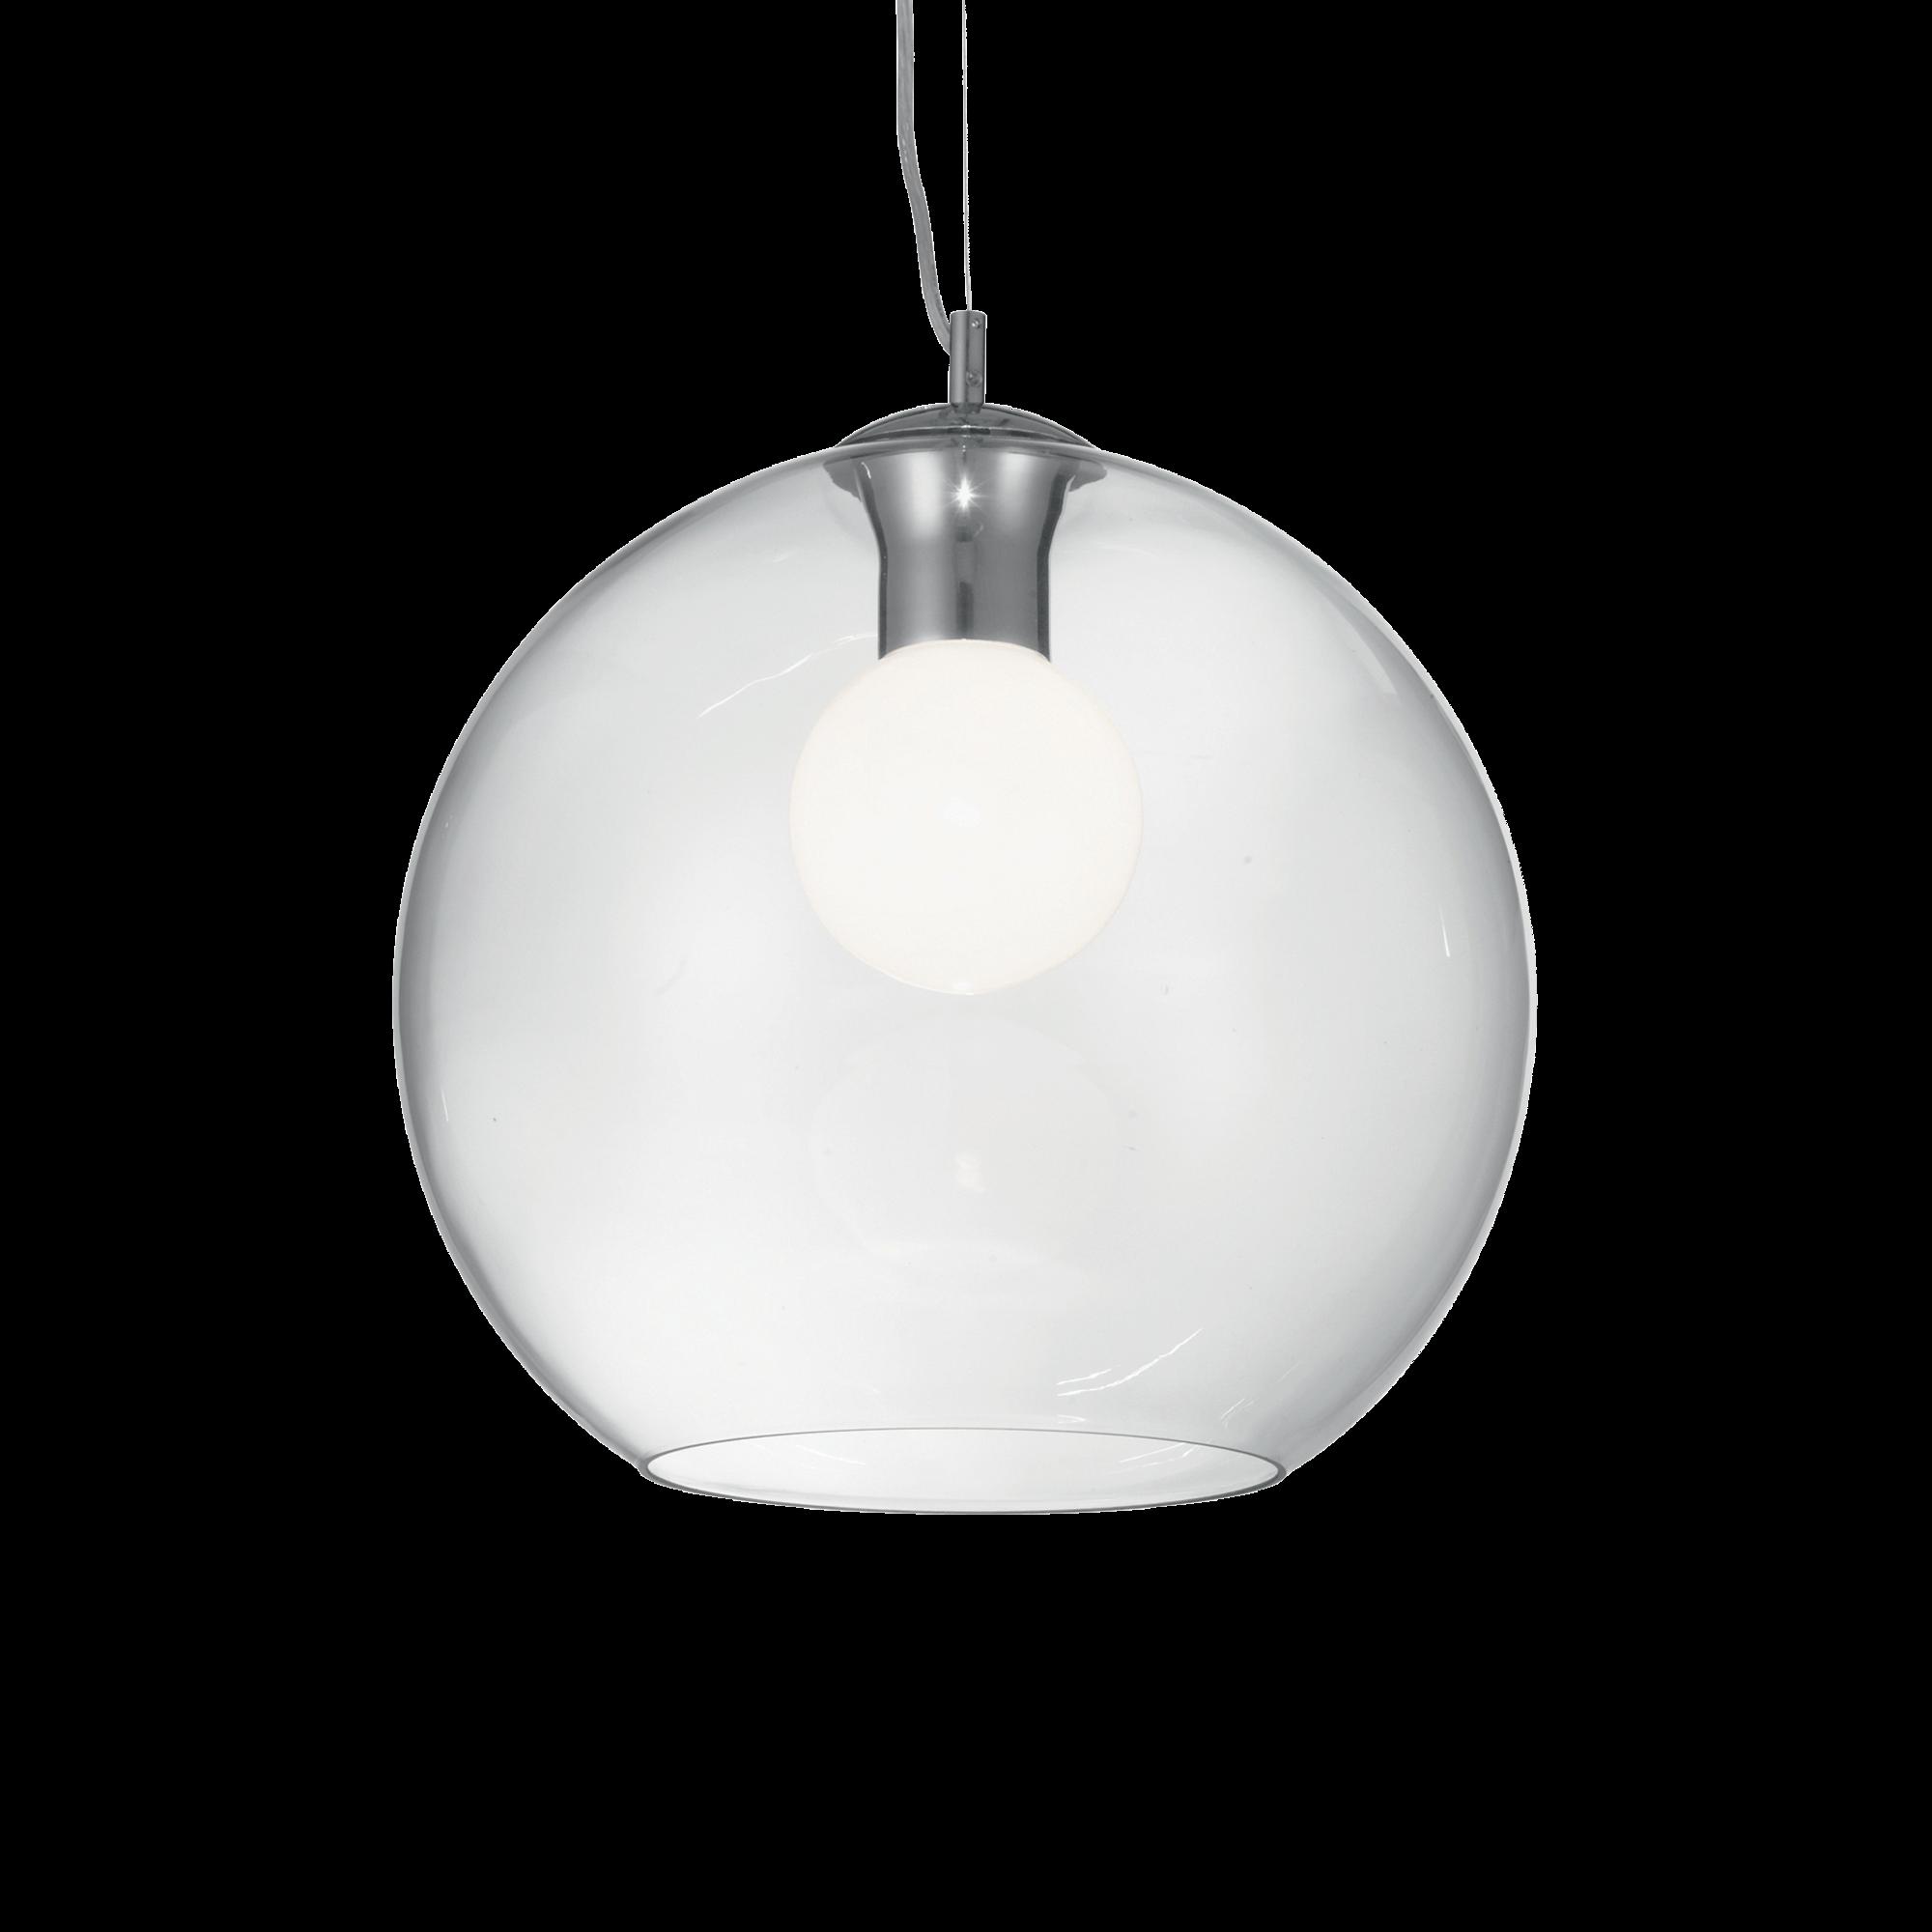 Ideal Lux 052816 Nemo SP1 D40 Clear lámpa függeszték